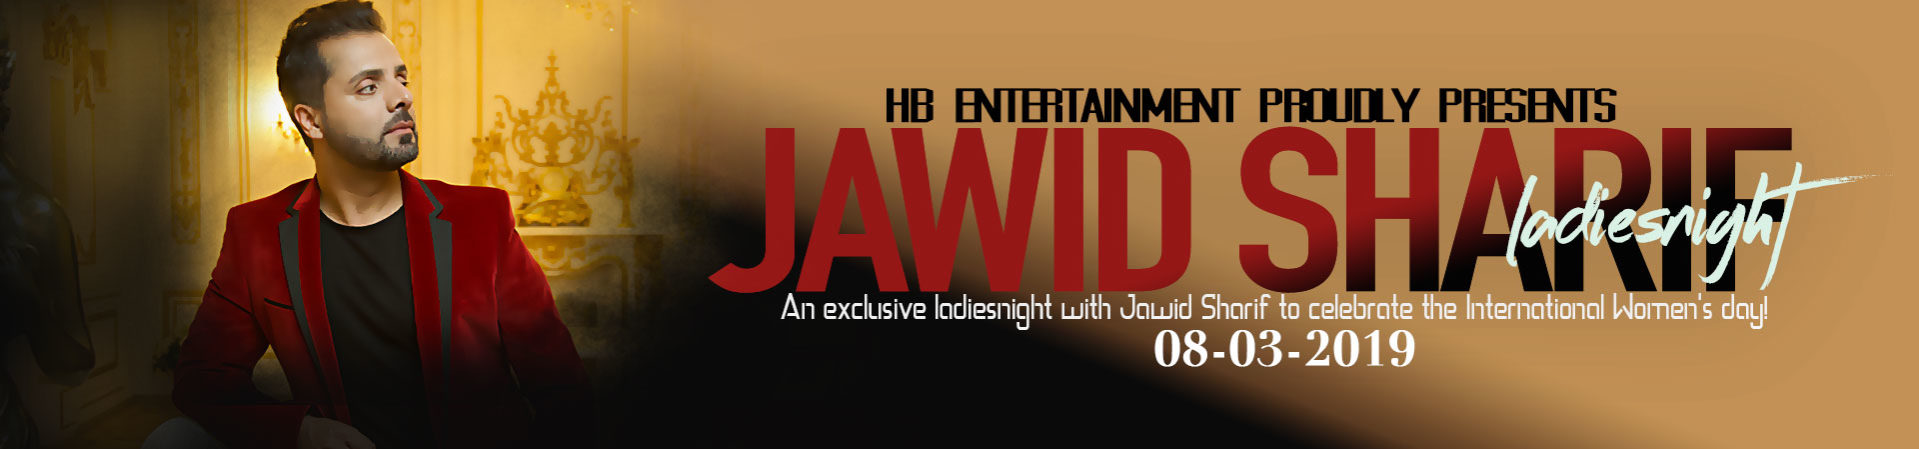 Jawid Sharif 1920x450